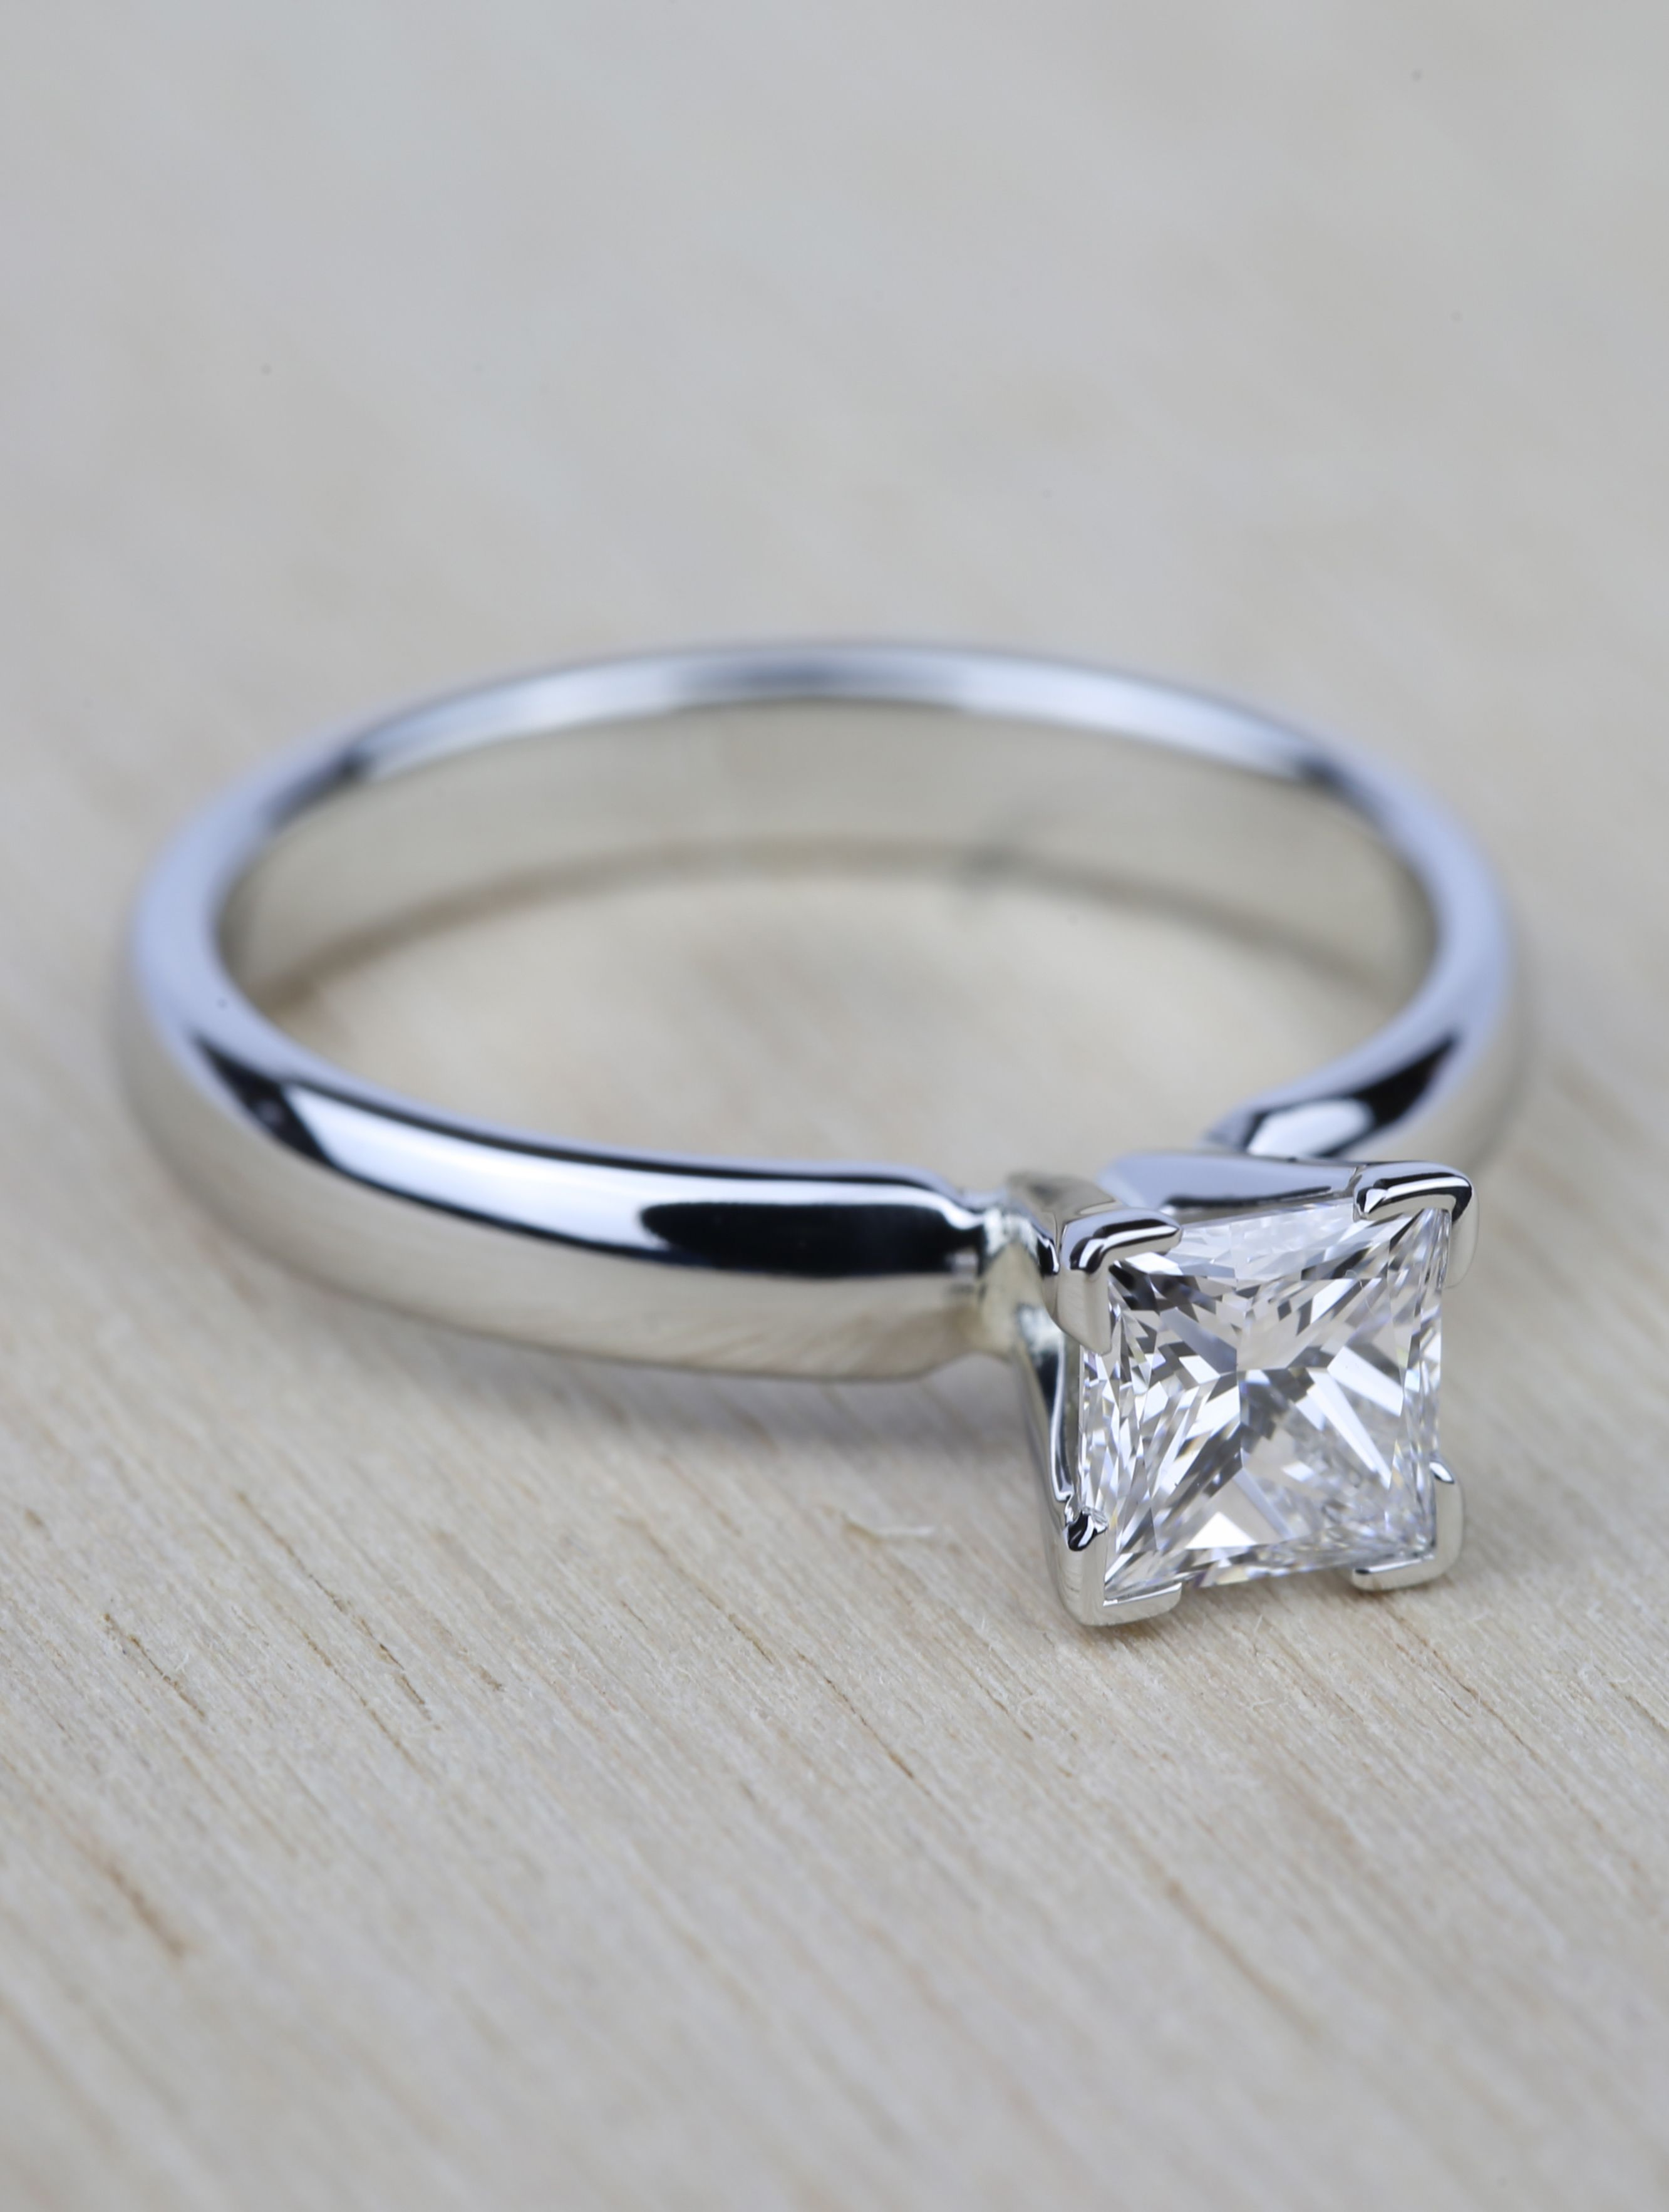 A beautiful recently purchased comfortfit princess cut diamond